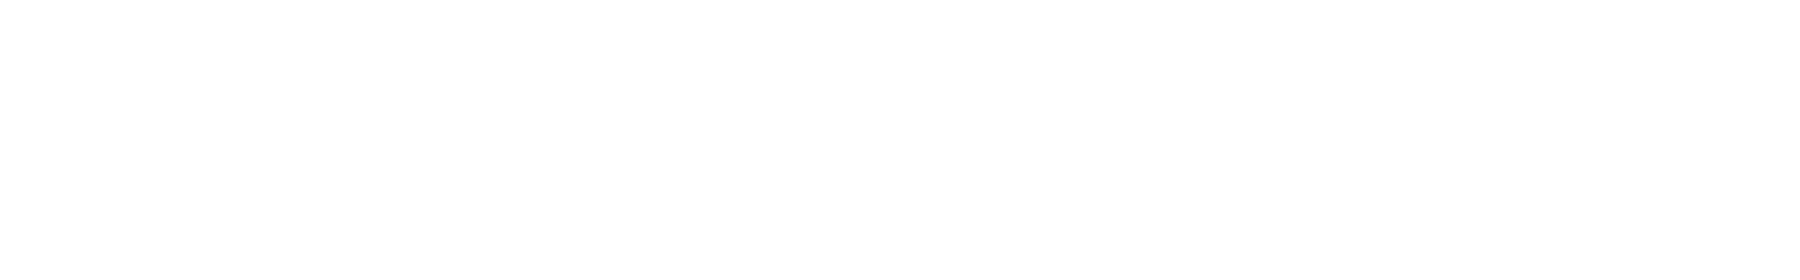 vedh melodyloop 068 amaj7 9 cm7 9 emaj7 fm7 11 gm 124bpm